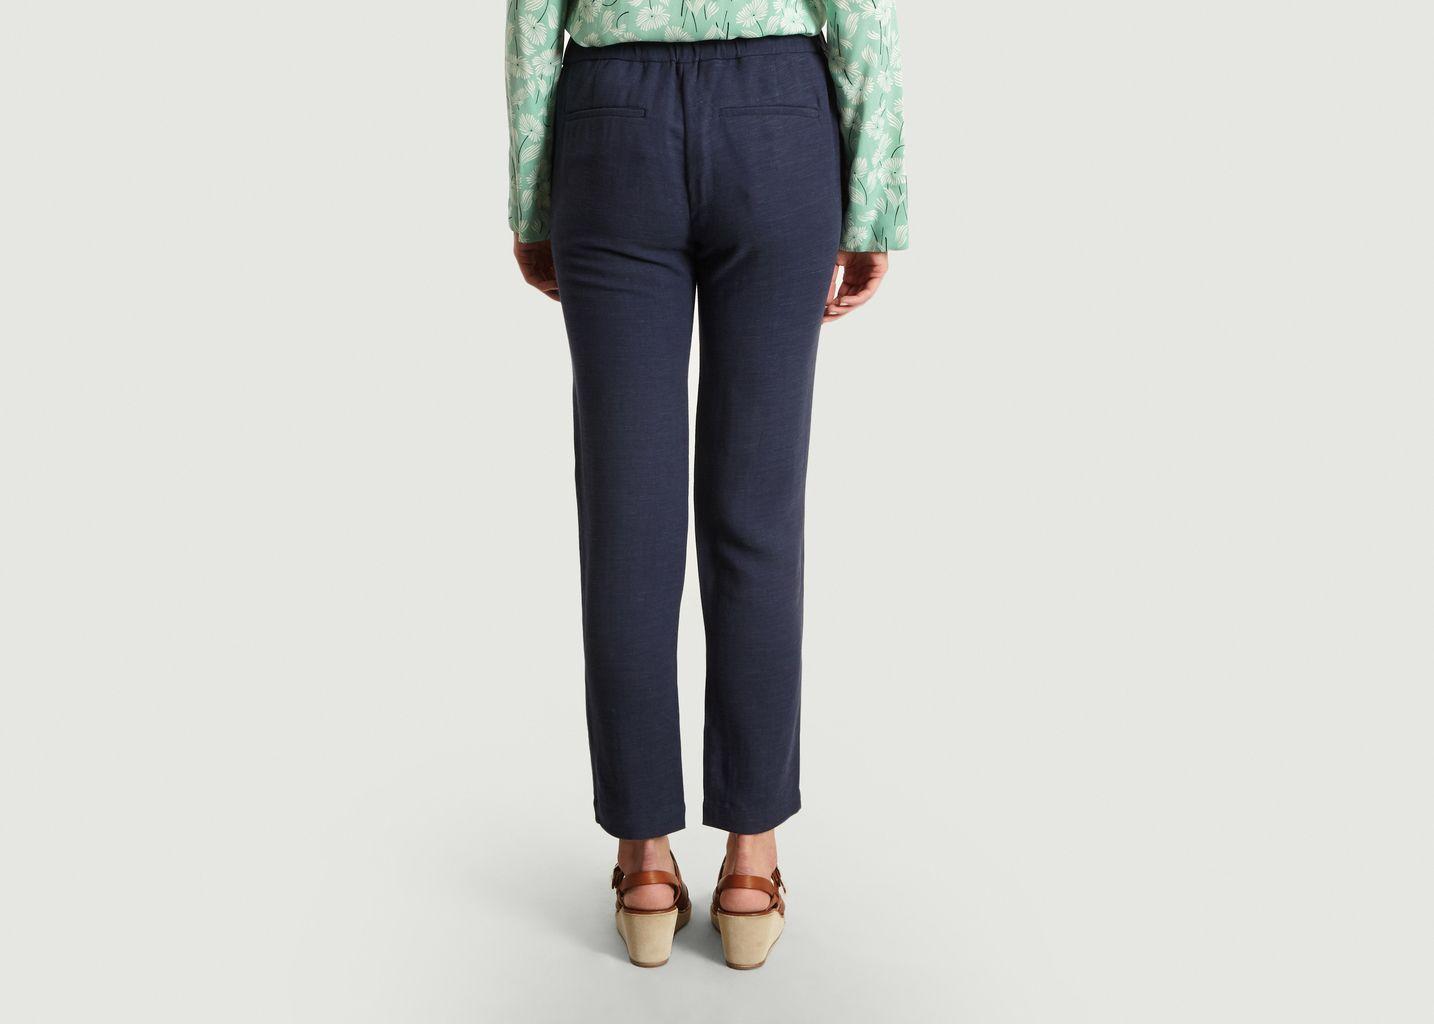 Pantalon Health - Sessun